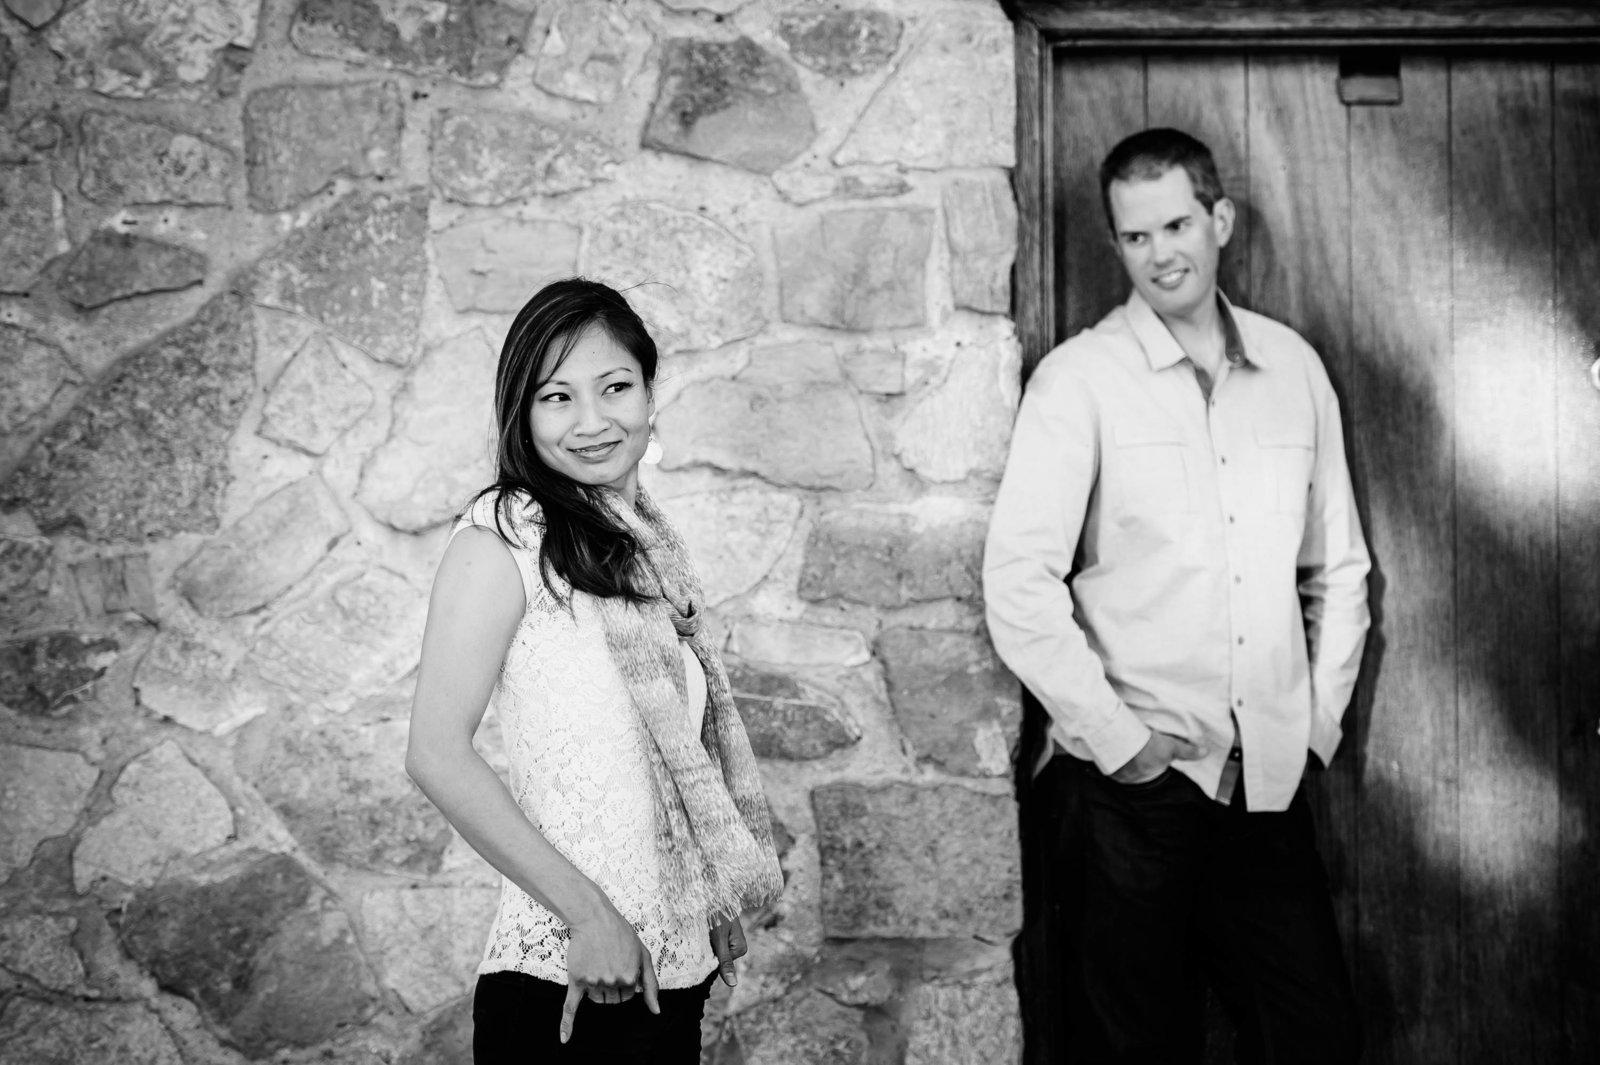 064-El-paso-wedding-photographer-HeRi_0093